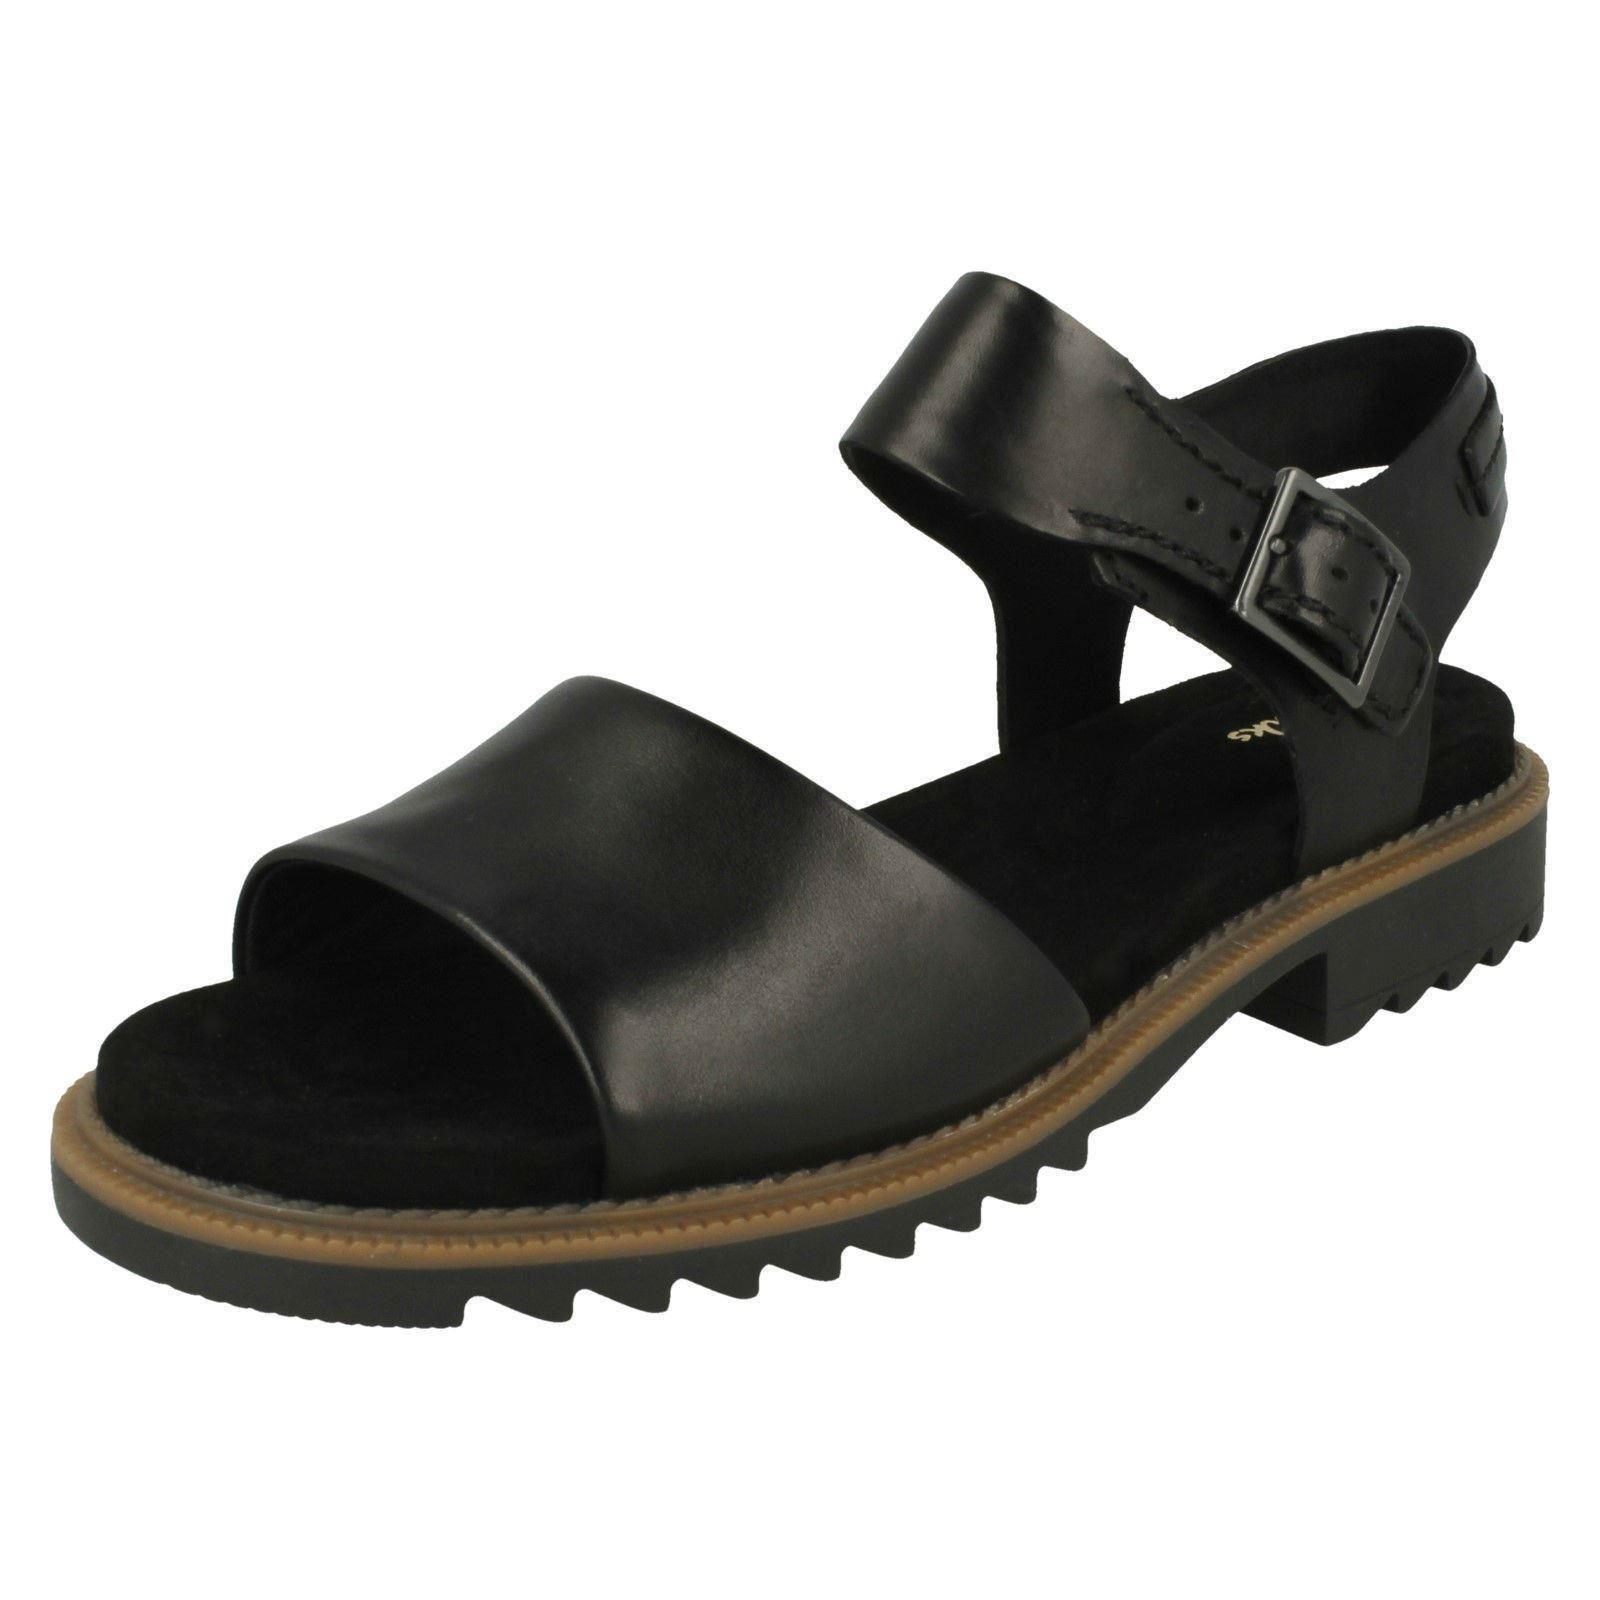 Damas Damas Damas Clarks Ferni fama de cuero negro Sandalias Informales-D MONTAJE  ¡No dudes! ¡Compra ahora!